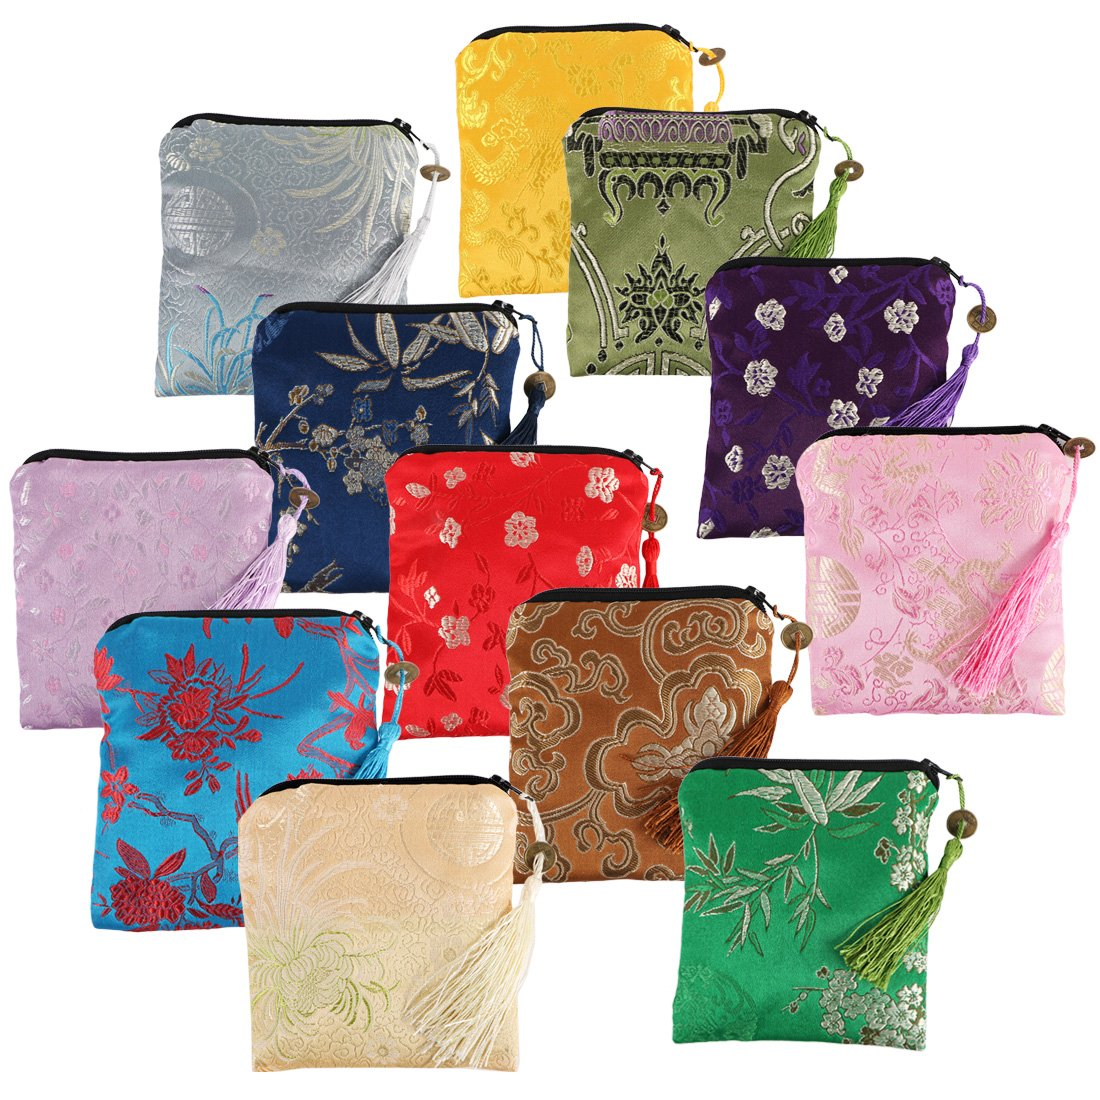 kilofly 12pc Silk Brocade Tasseled Coin Purse Zipper Jewelry Pouch Bag Value Set TBA407set12